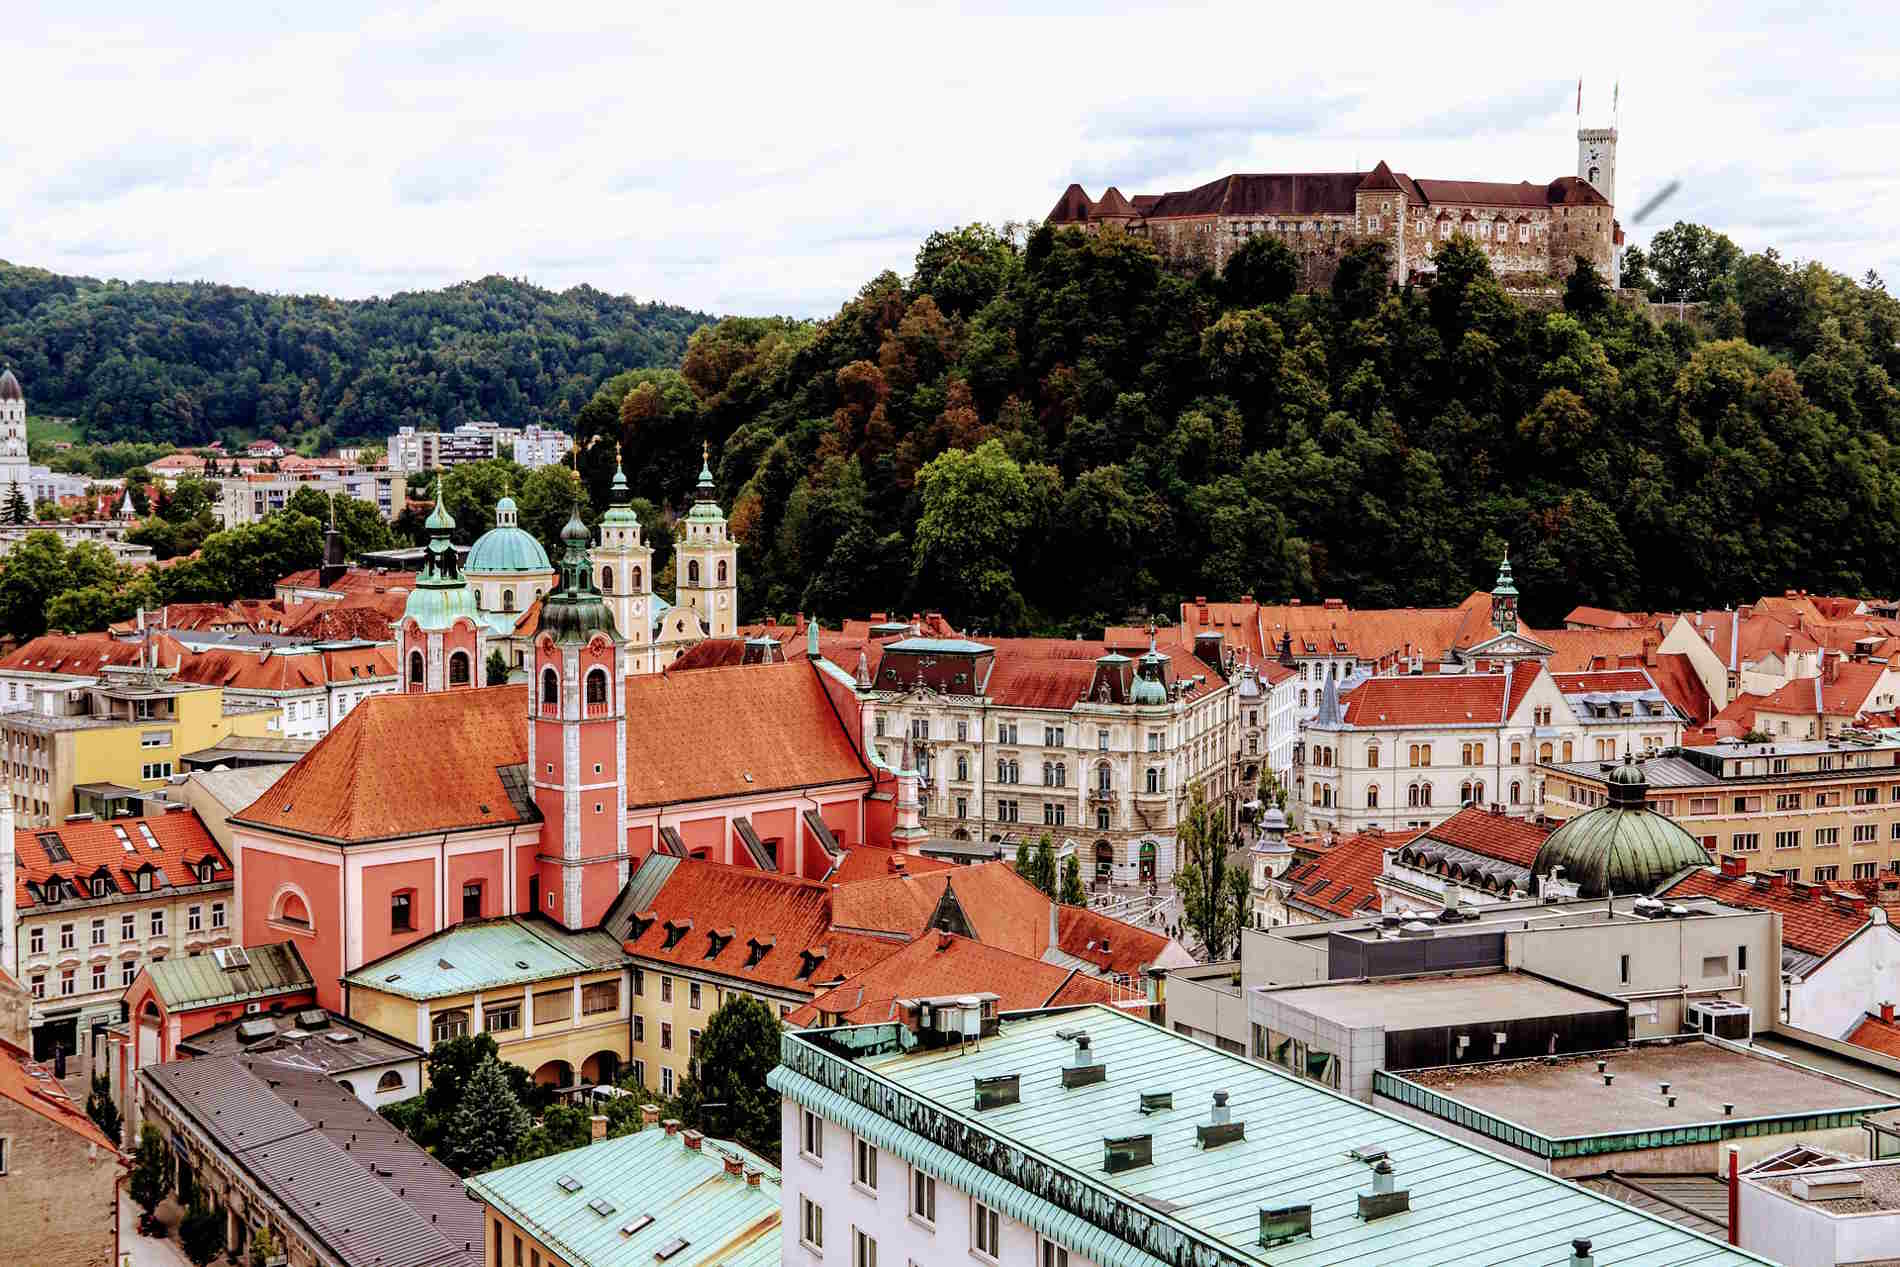 Centro storico di Ljubljana (Lubiana) in Slovenia